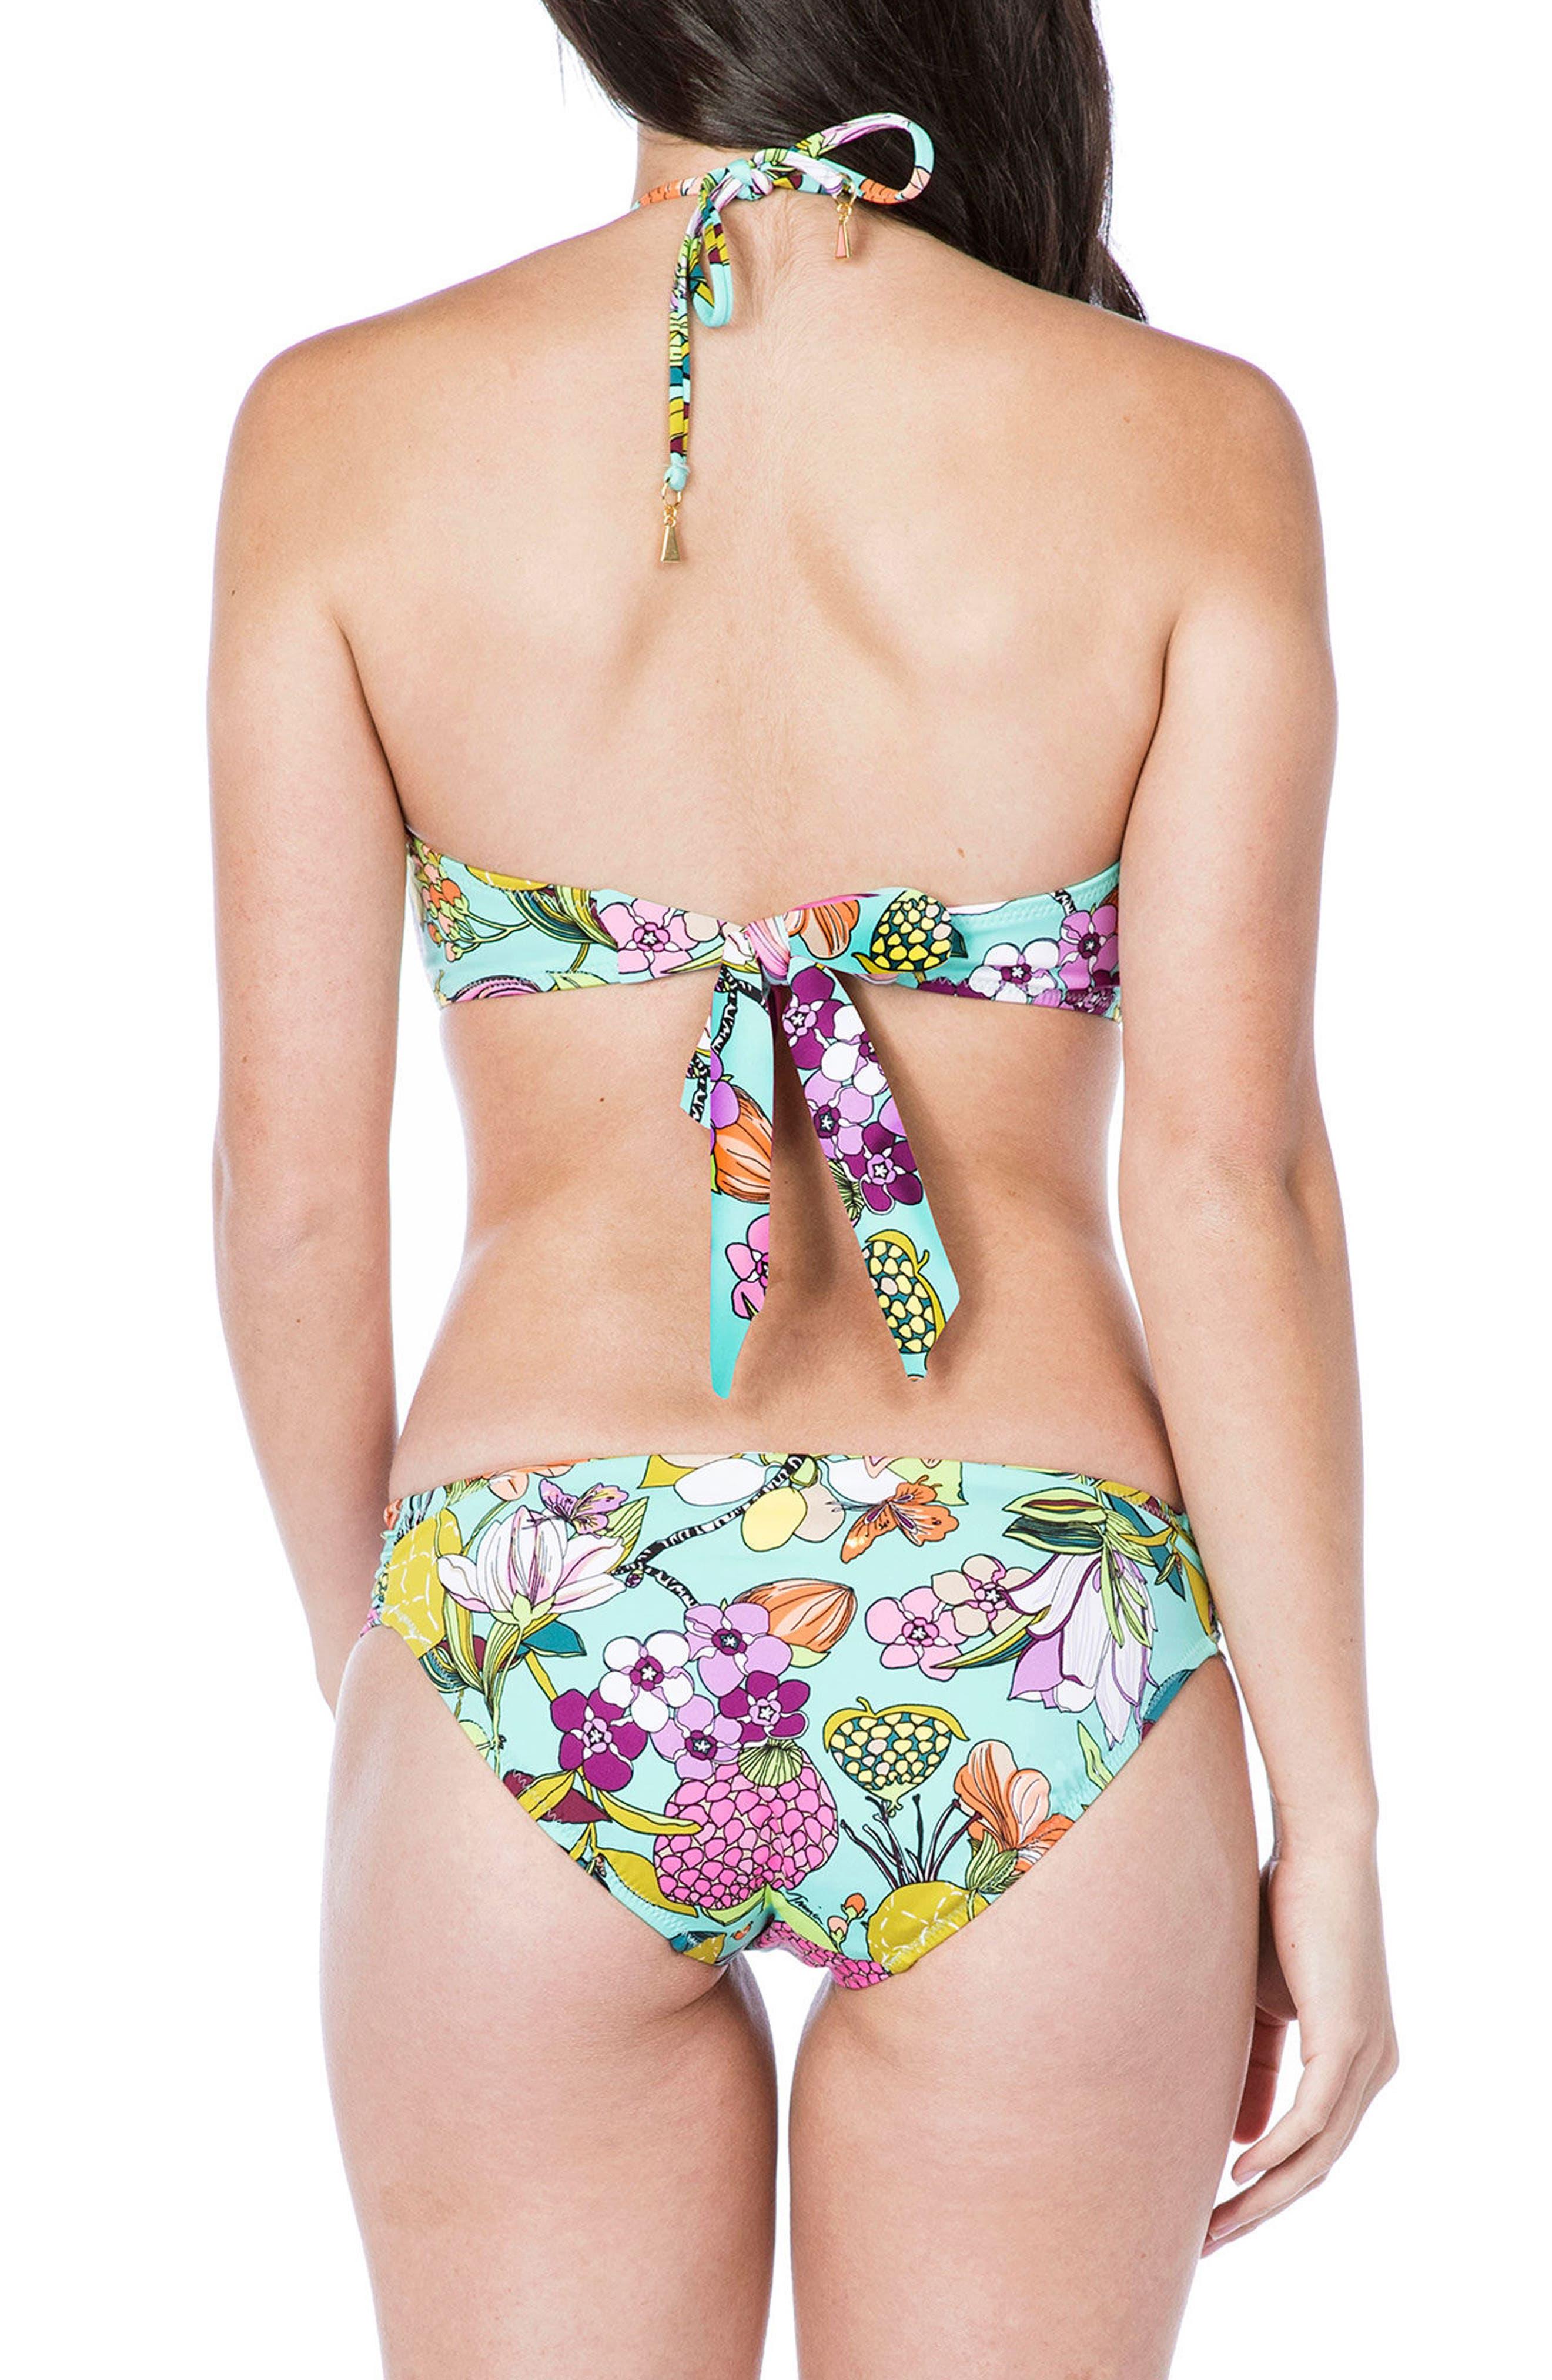 Key West Bandeau Bikini Top,                             Alternate thumbnail 4, color,                             Aqua